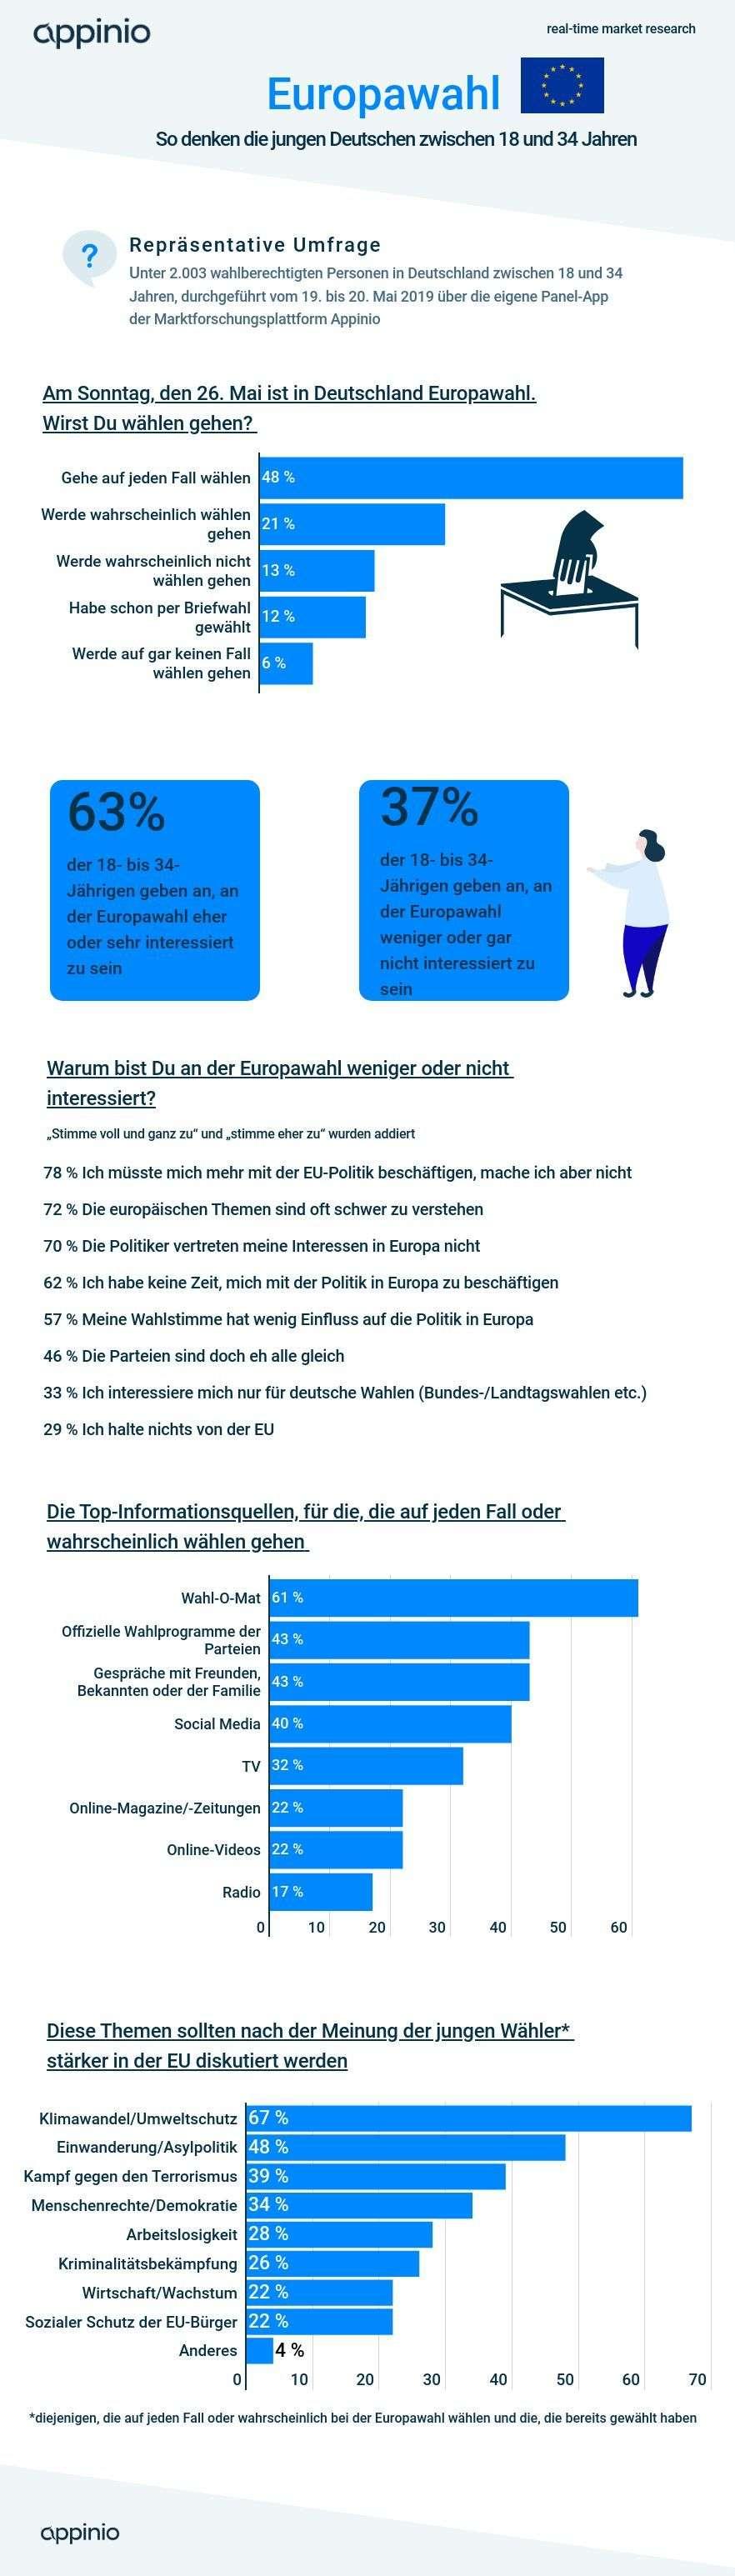 Appinio_Infografik_Europawahl_18-34-2